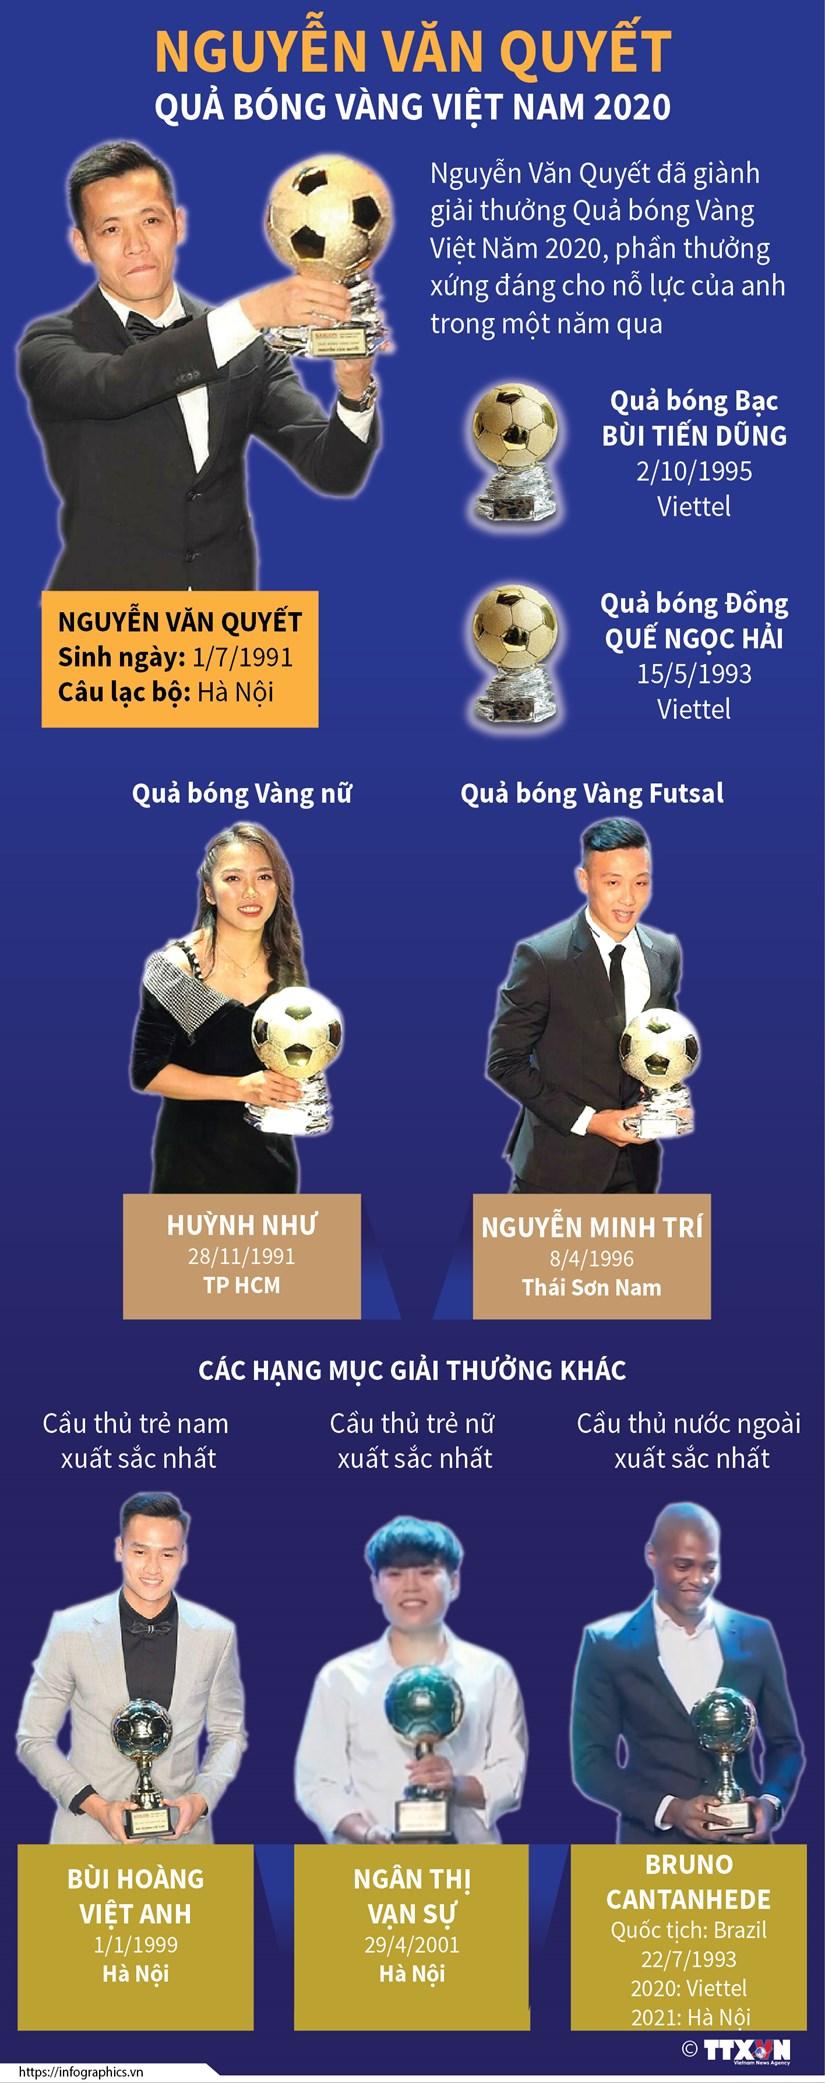 [Infographics] Nguyen Van Quyet gianh Qua bong Vang Viet Nam hinh anh 1